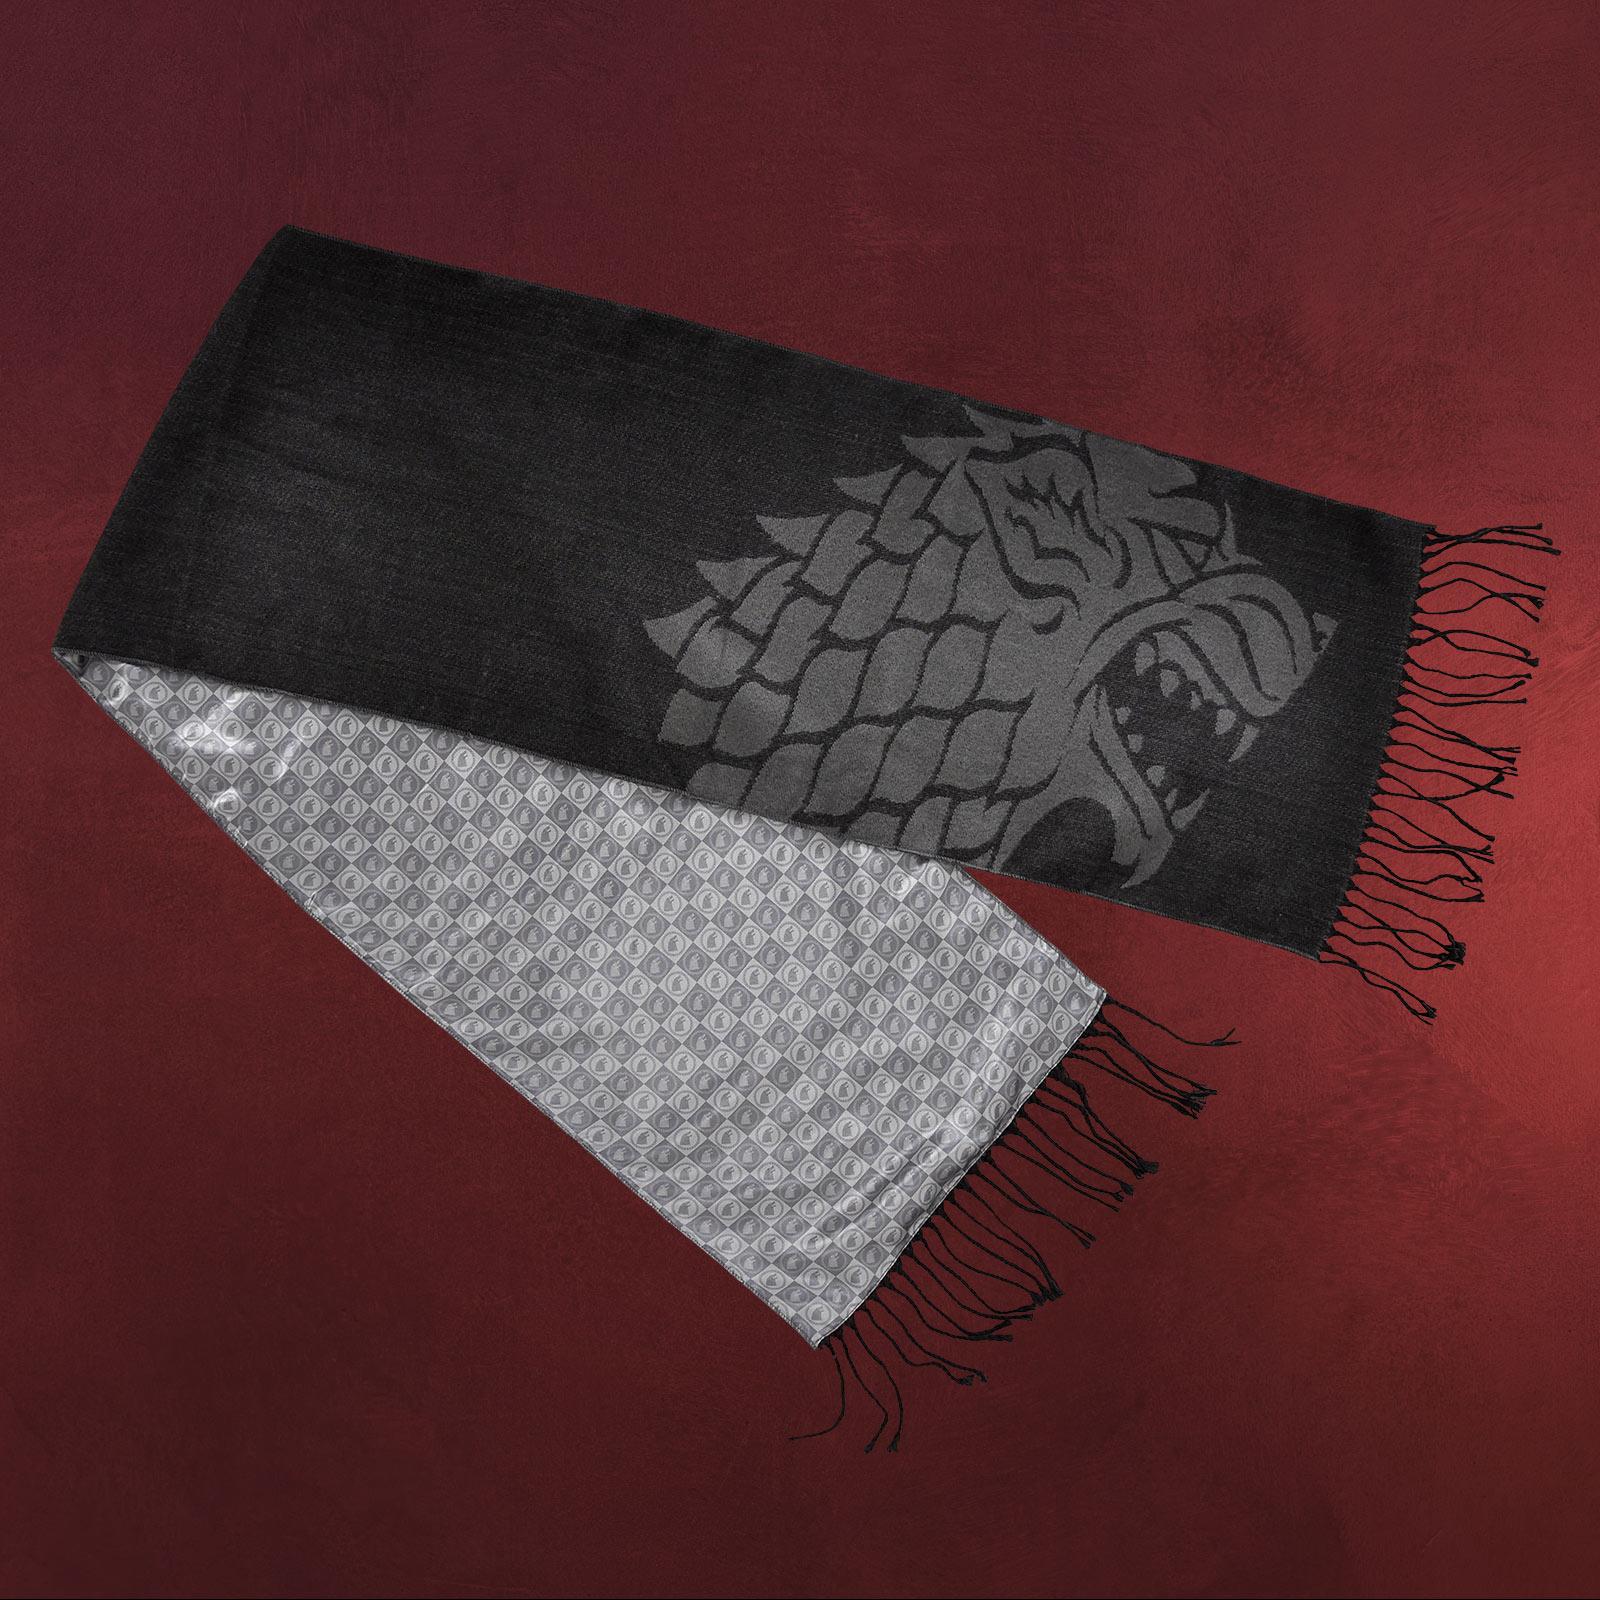 Game of Thrones - House Stark Schal